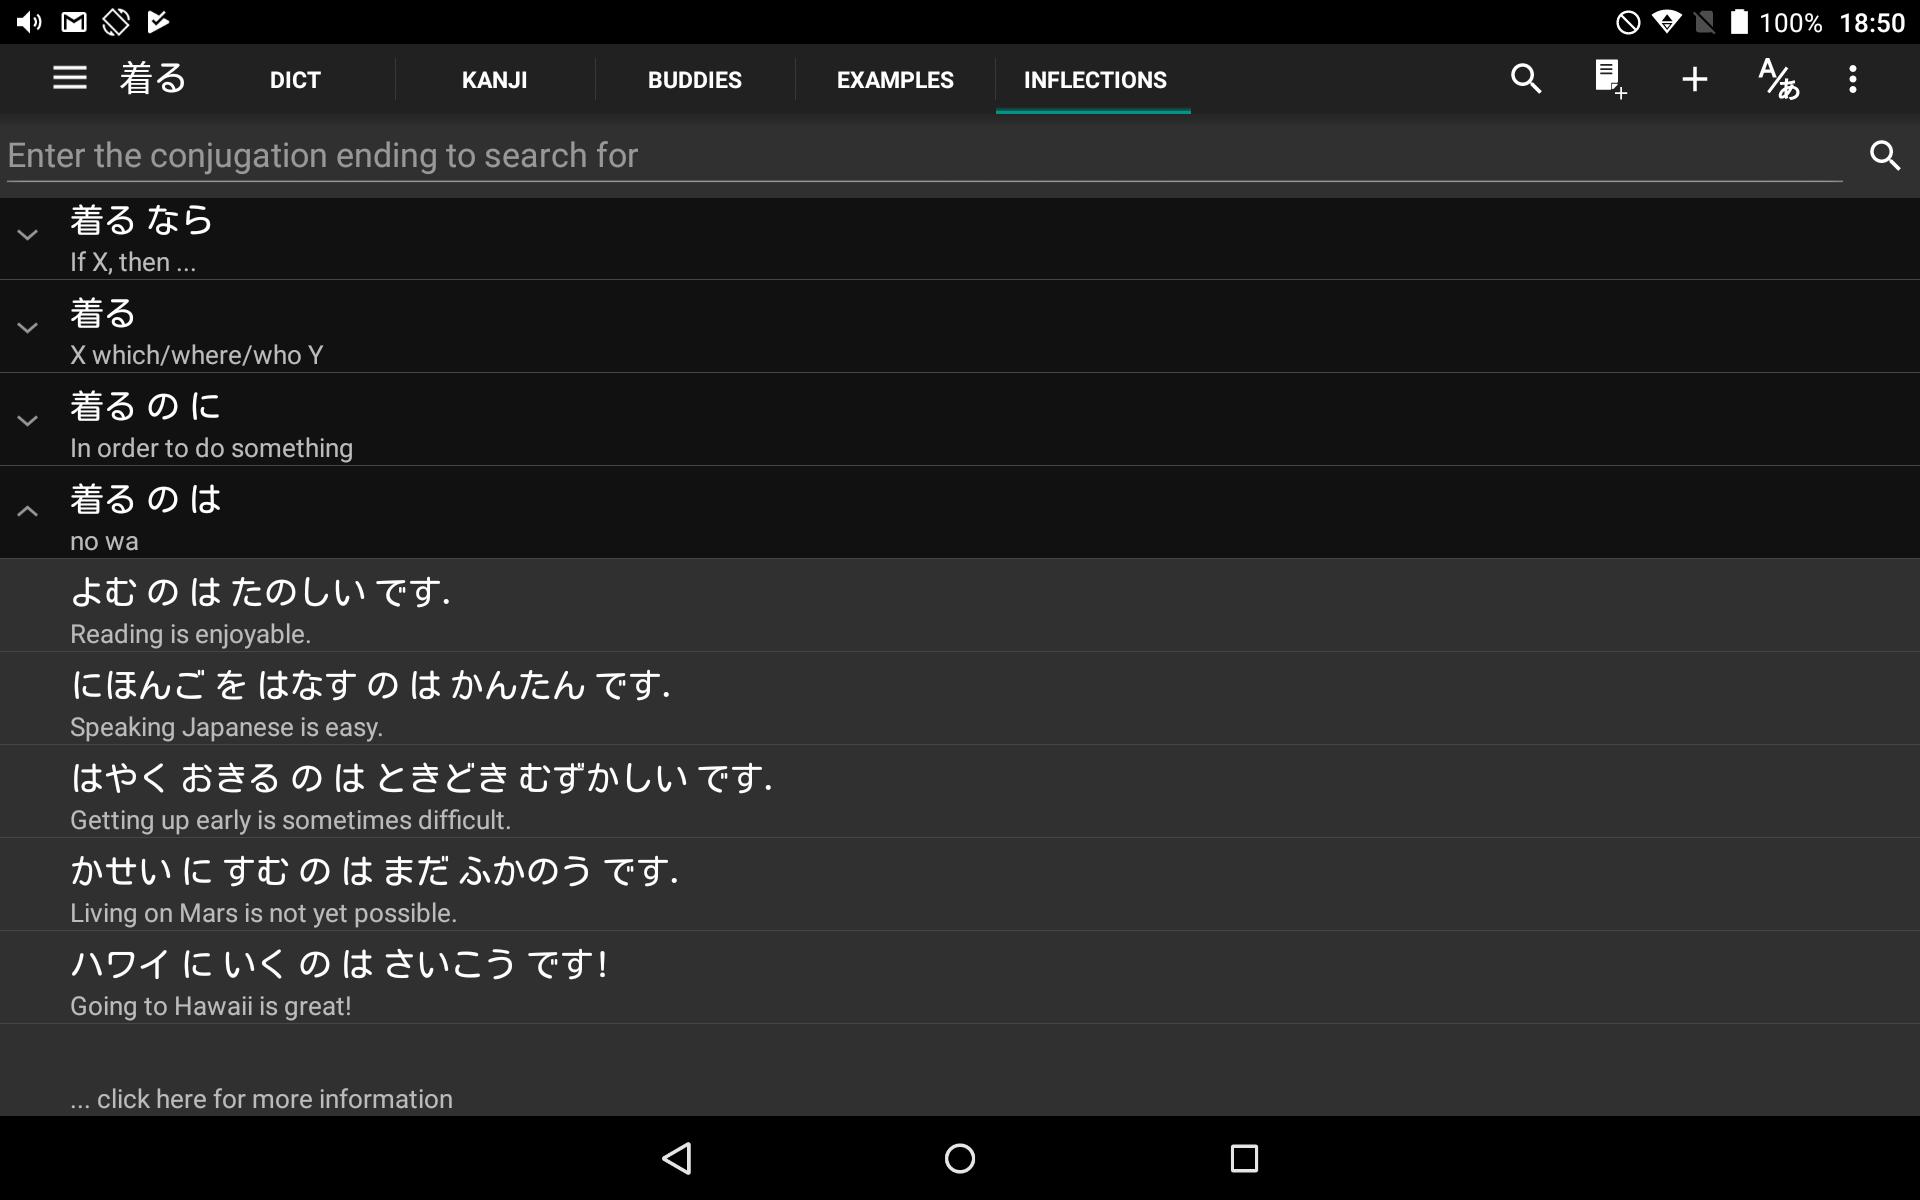 screenshot_2018-03-01-18-50-53